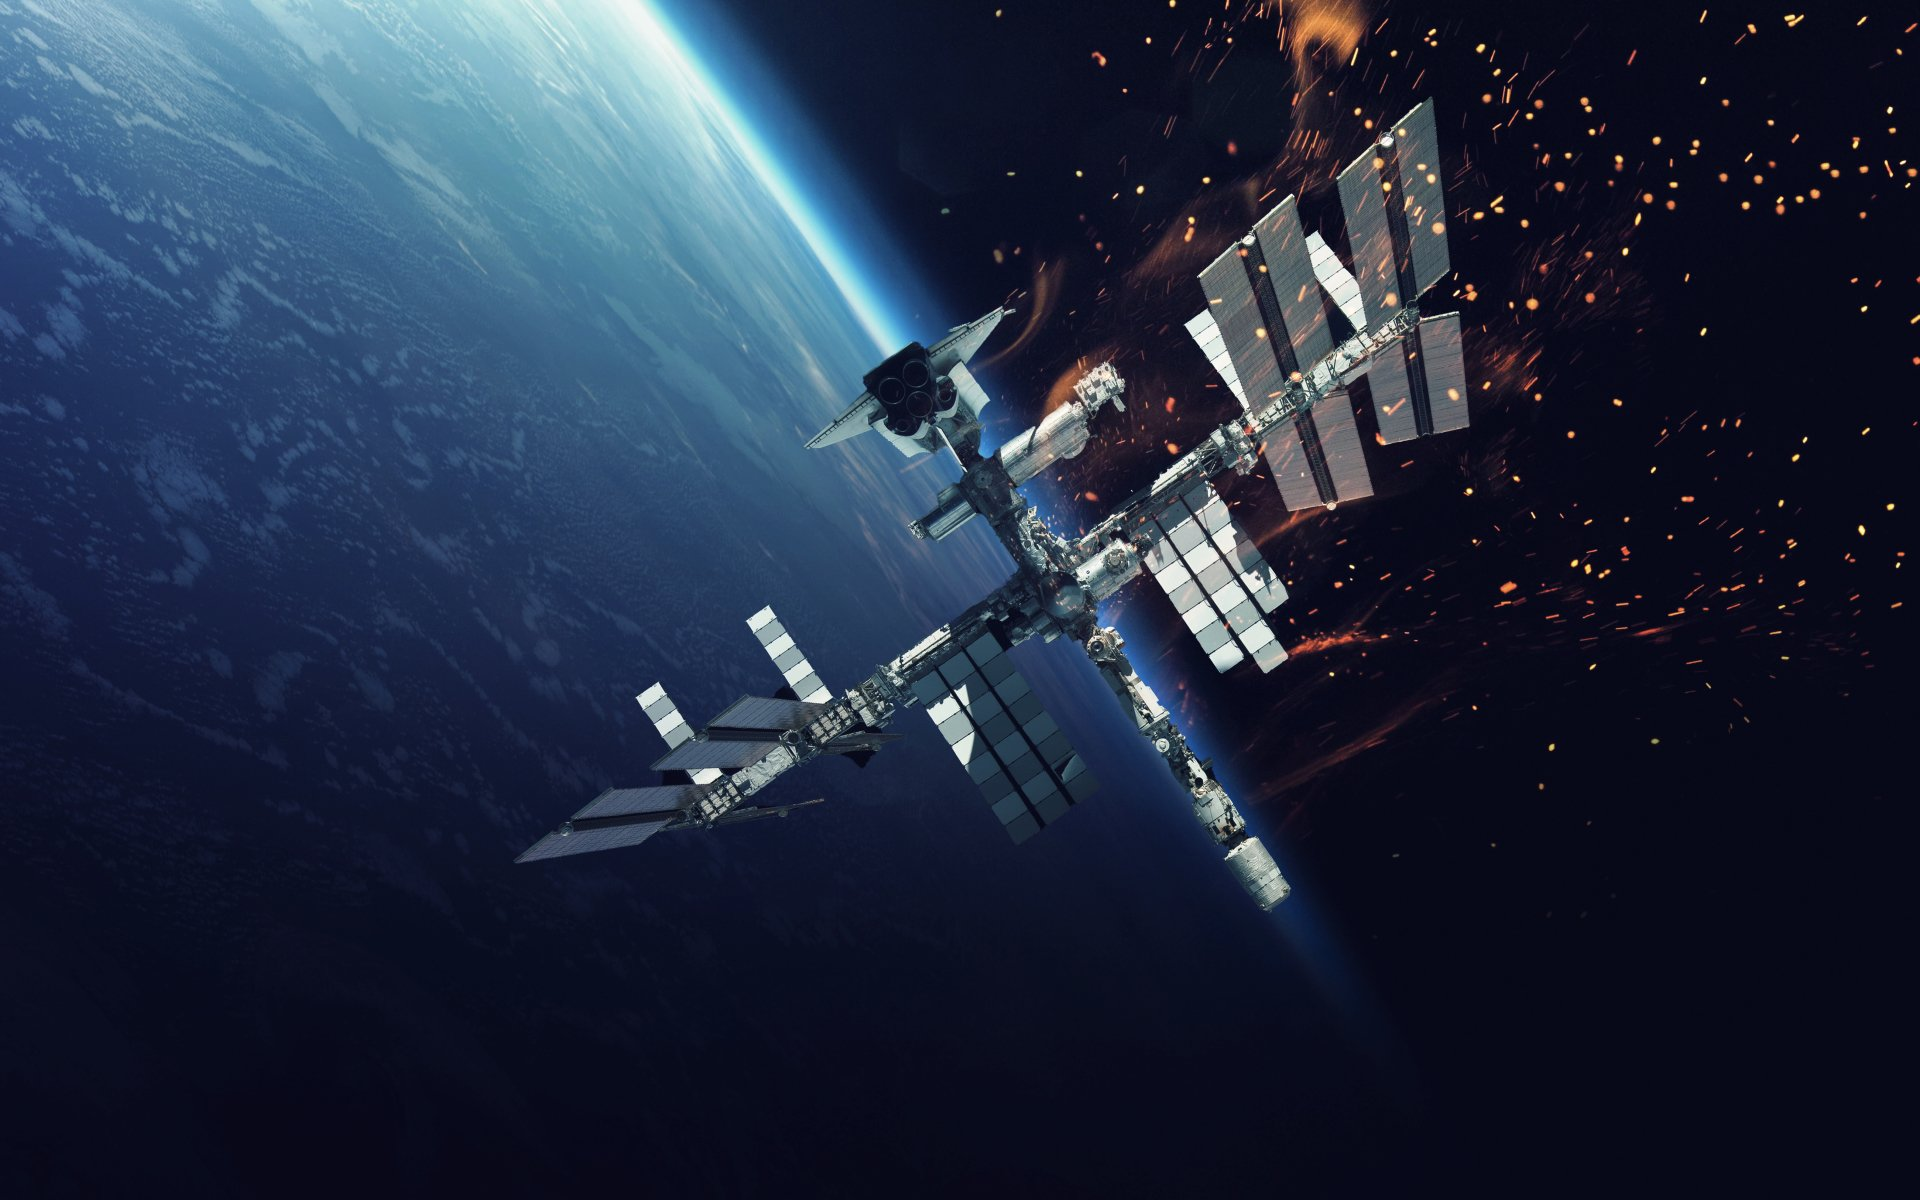 Satellite 5k retina ultra hd wallpaper background image 5200x3250 id 807194 wallpaper abyss - Satellite wallpaper hd ...